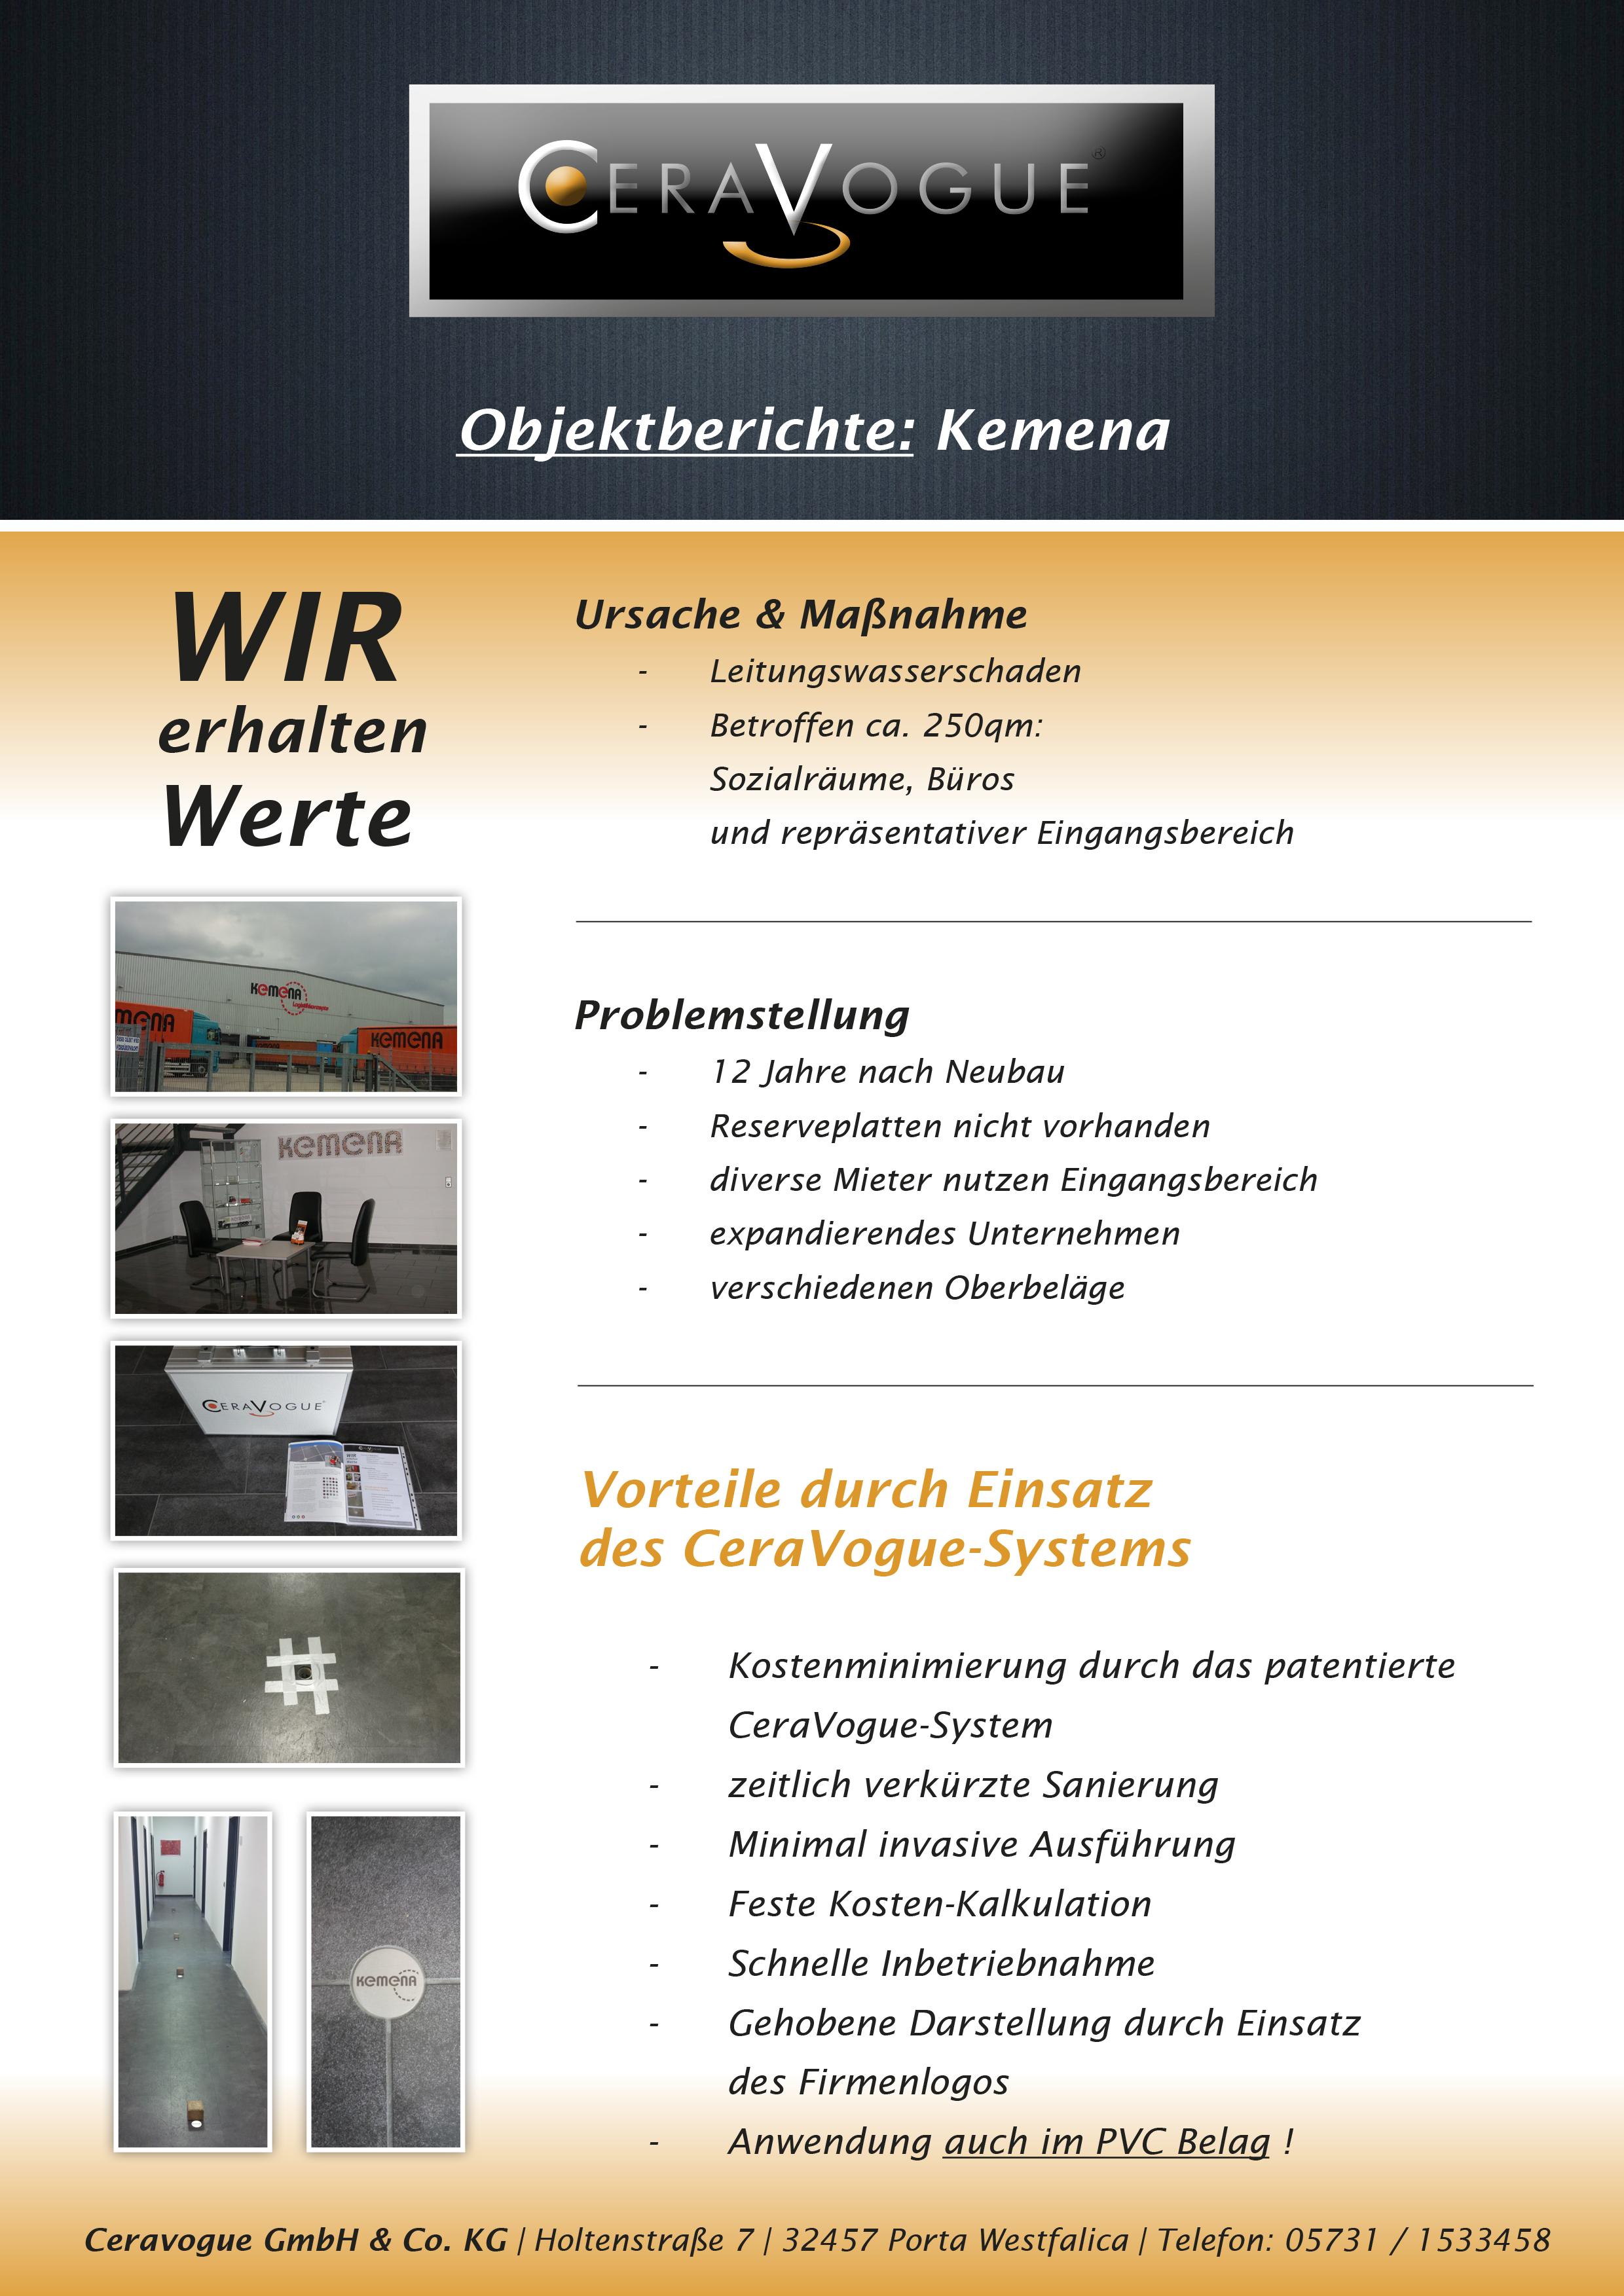 Objektbericht_Kemena